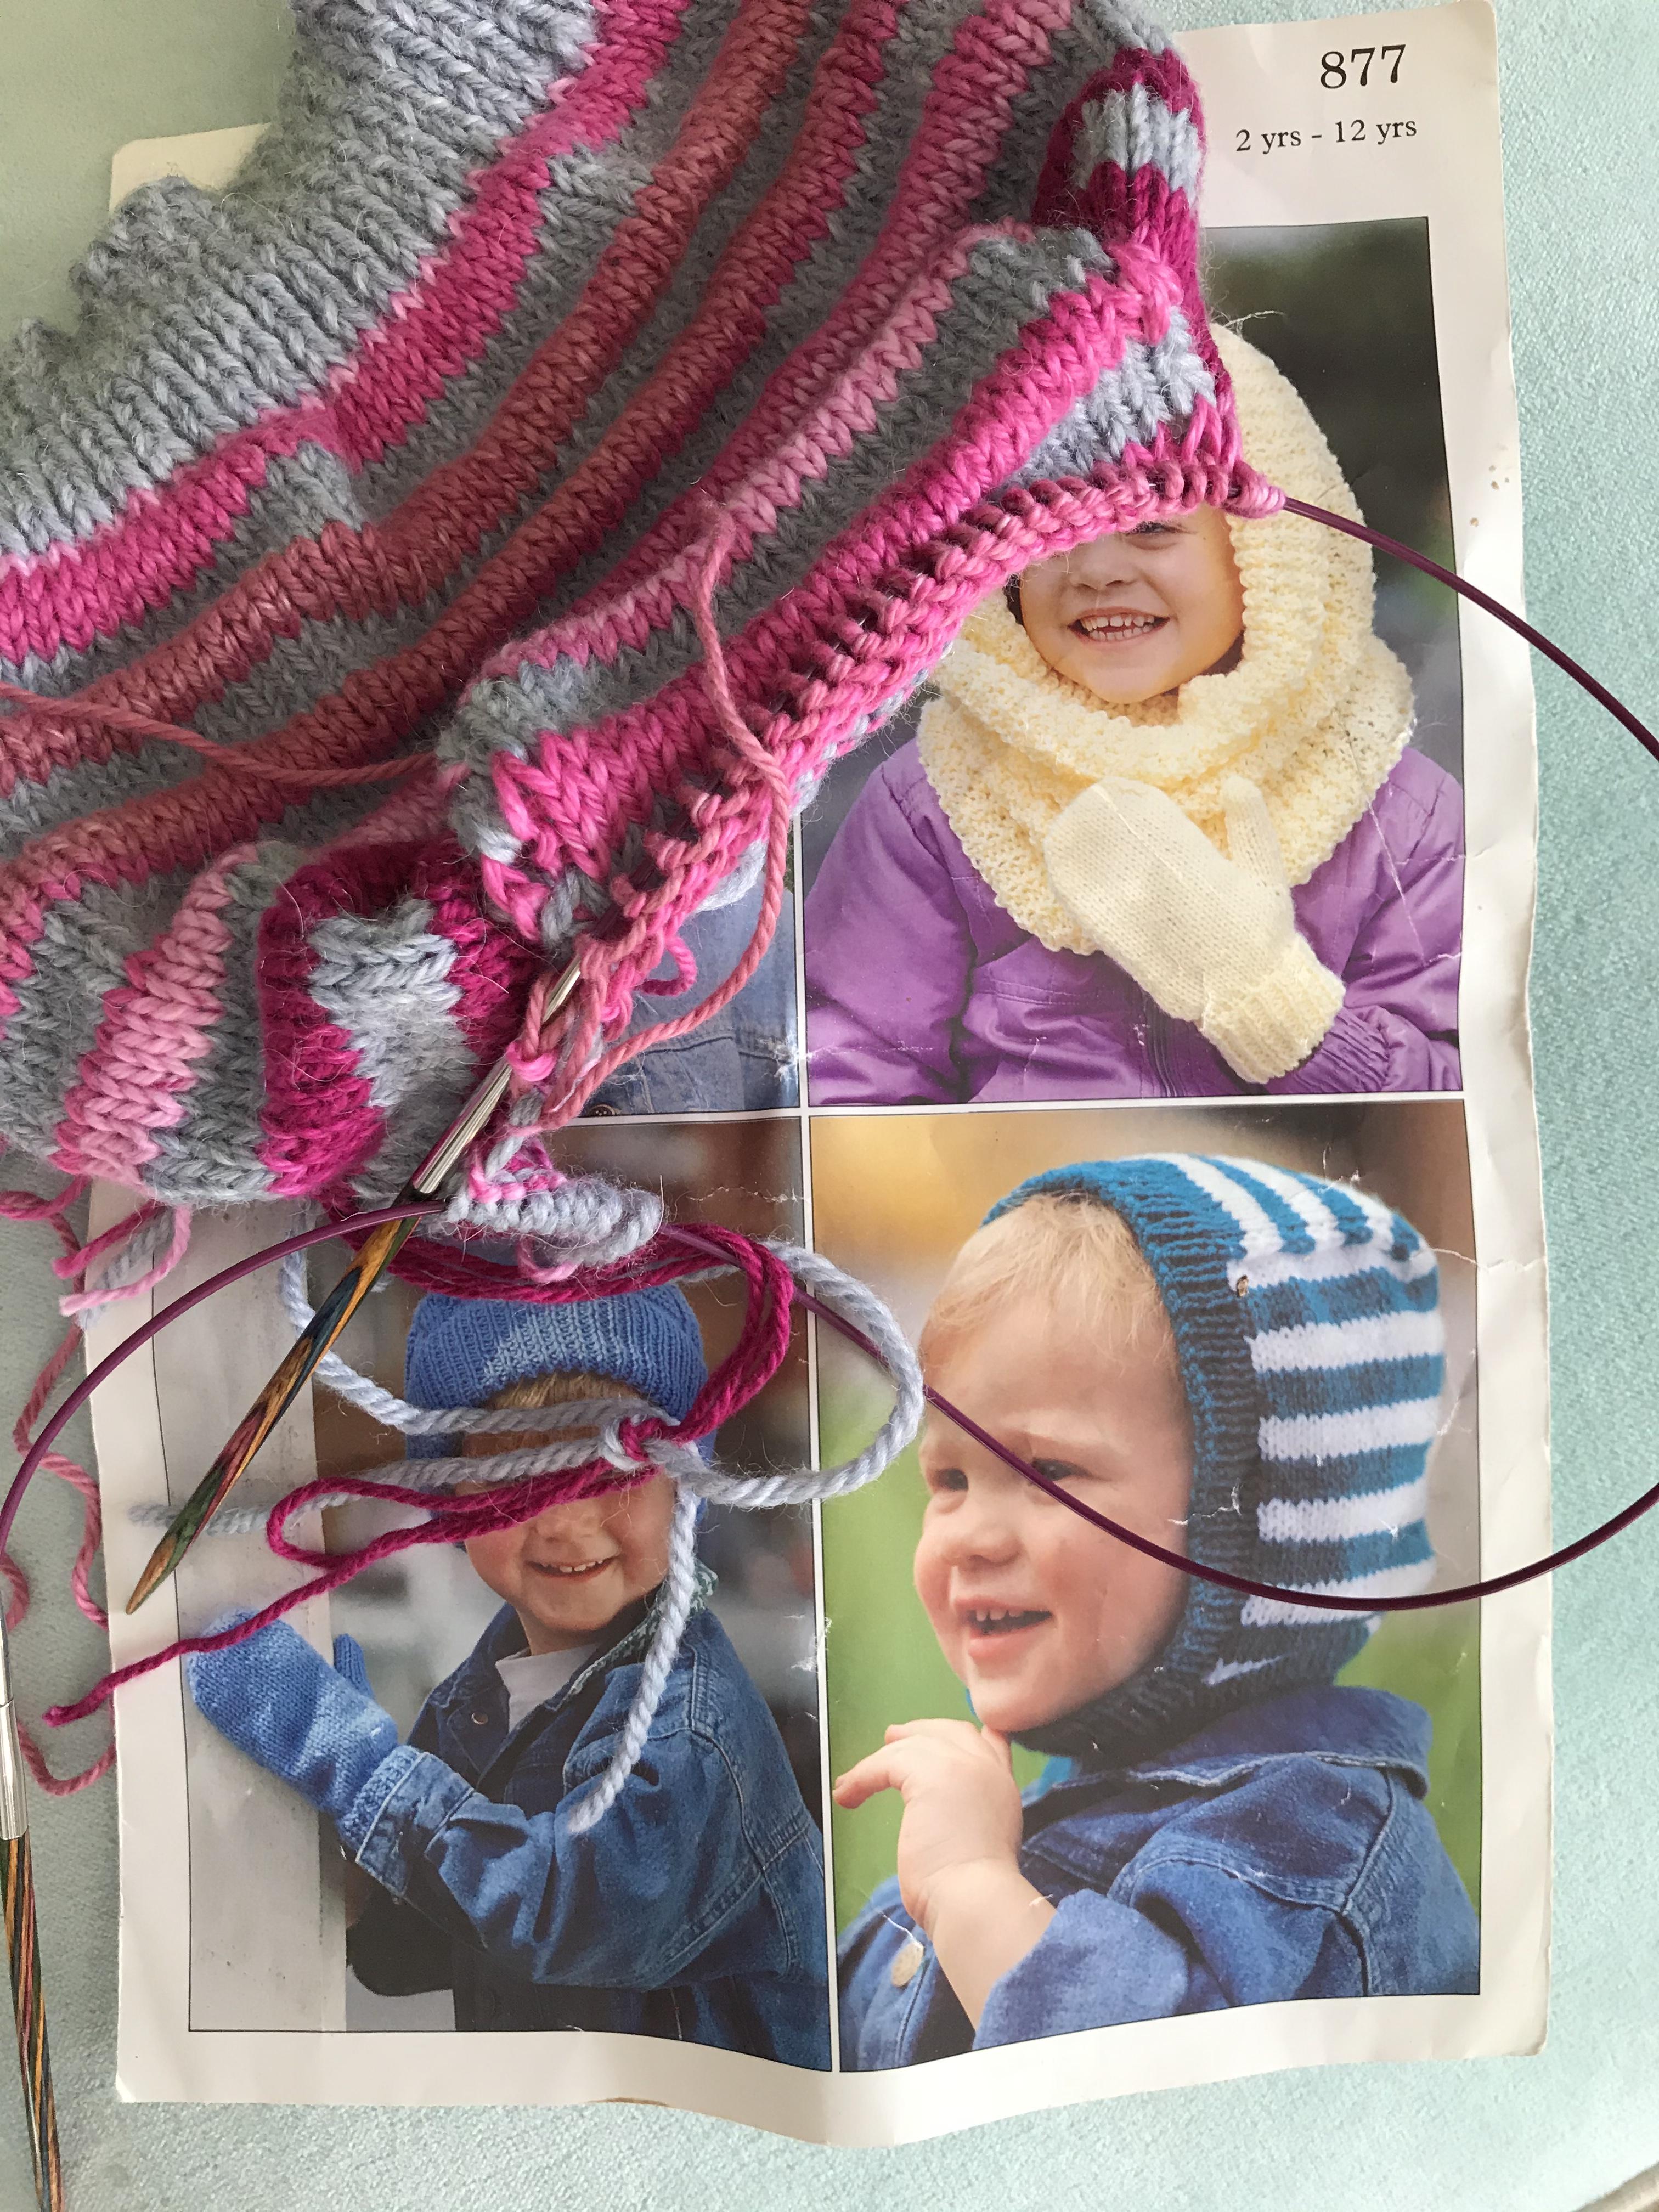 Knitting blog